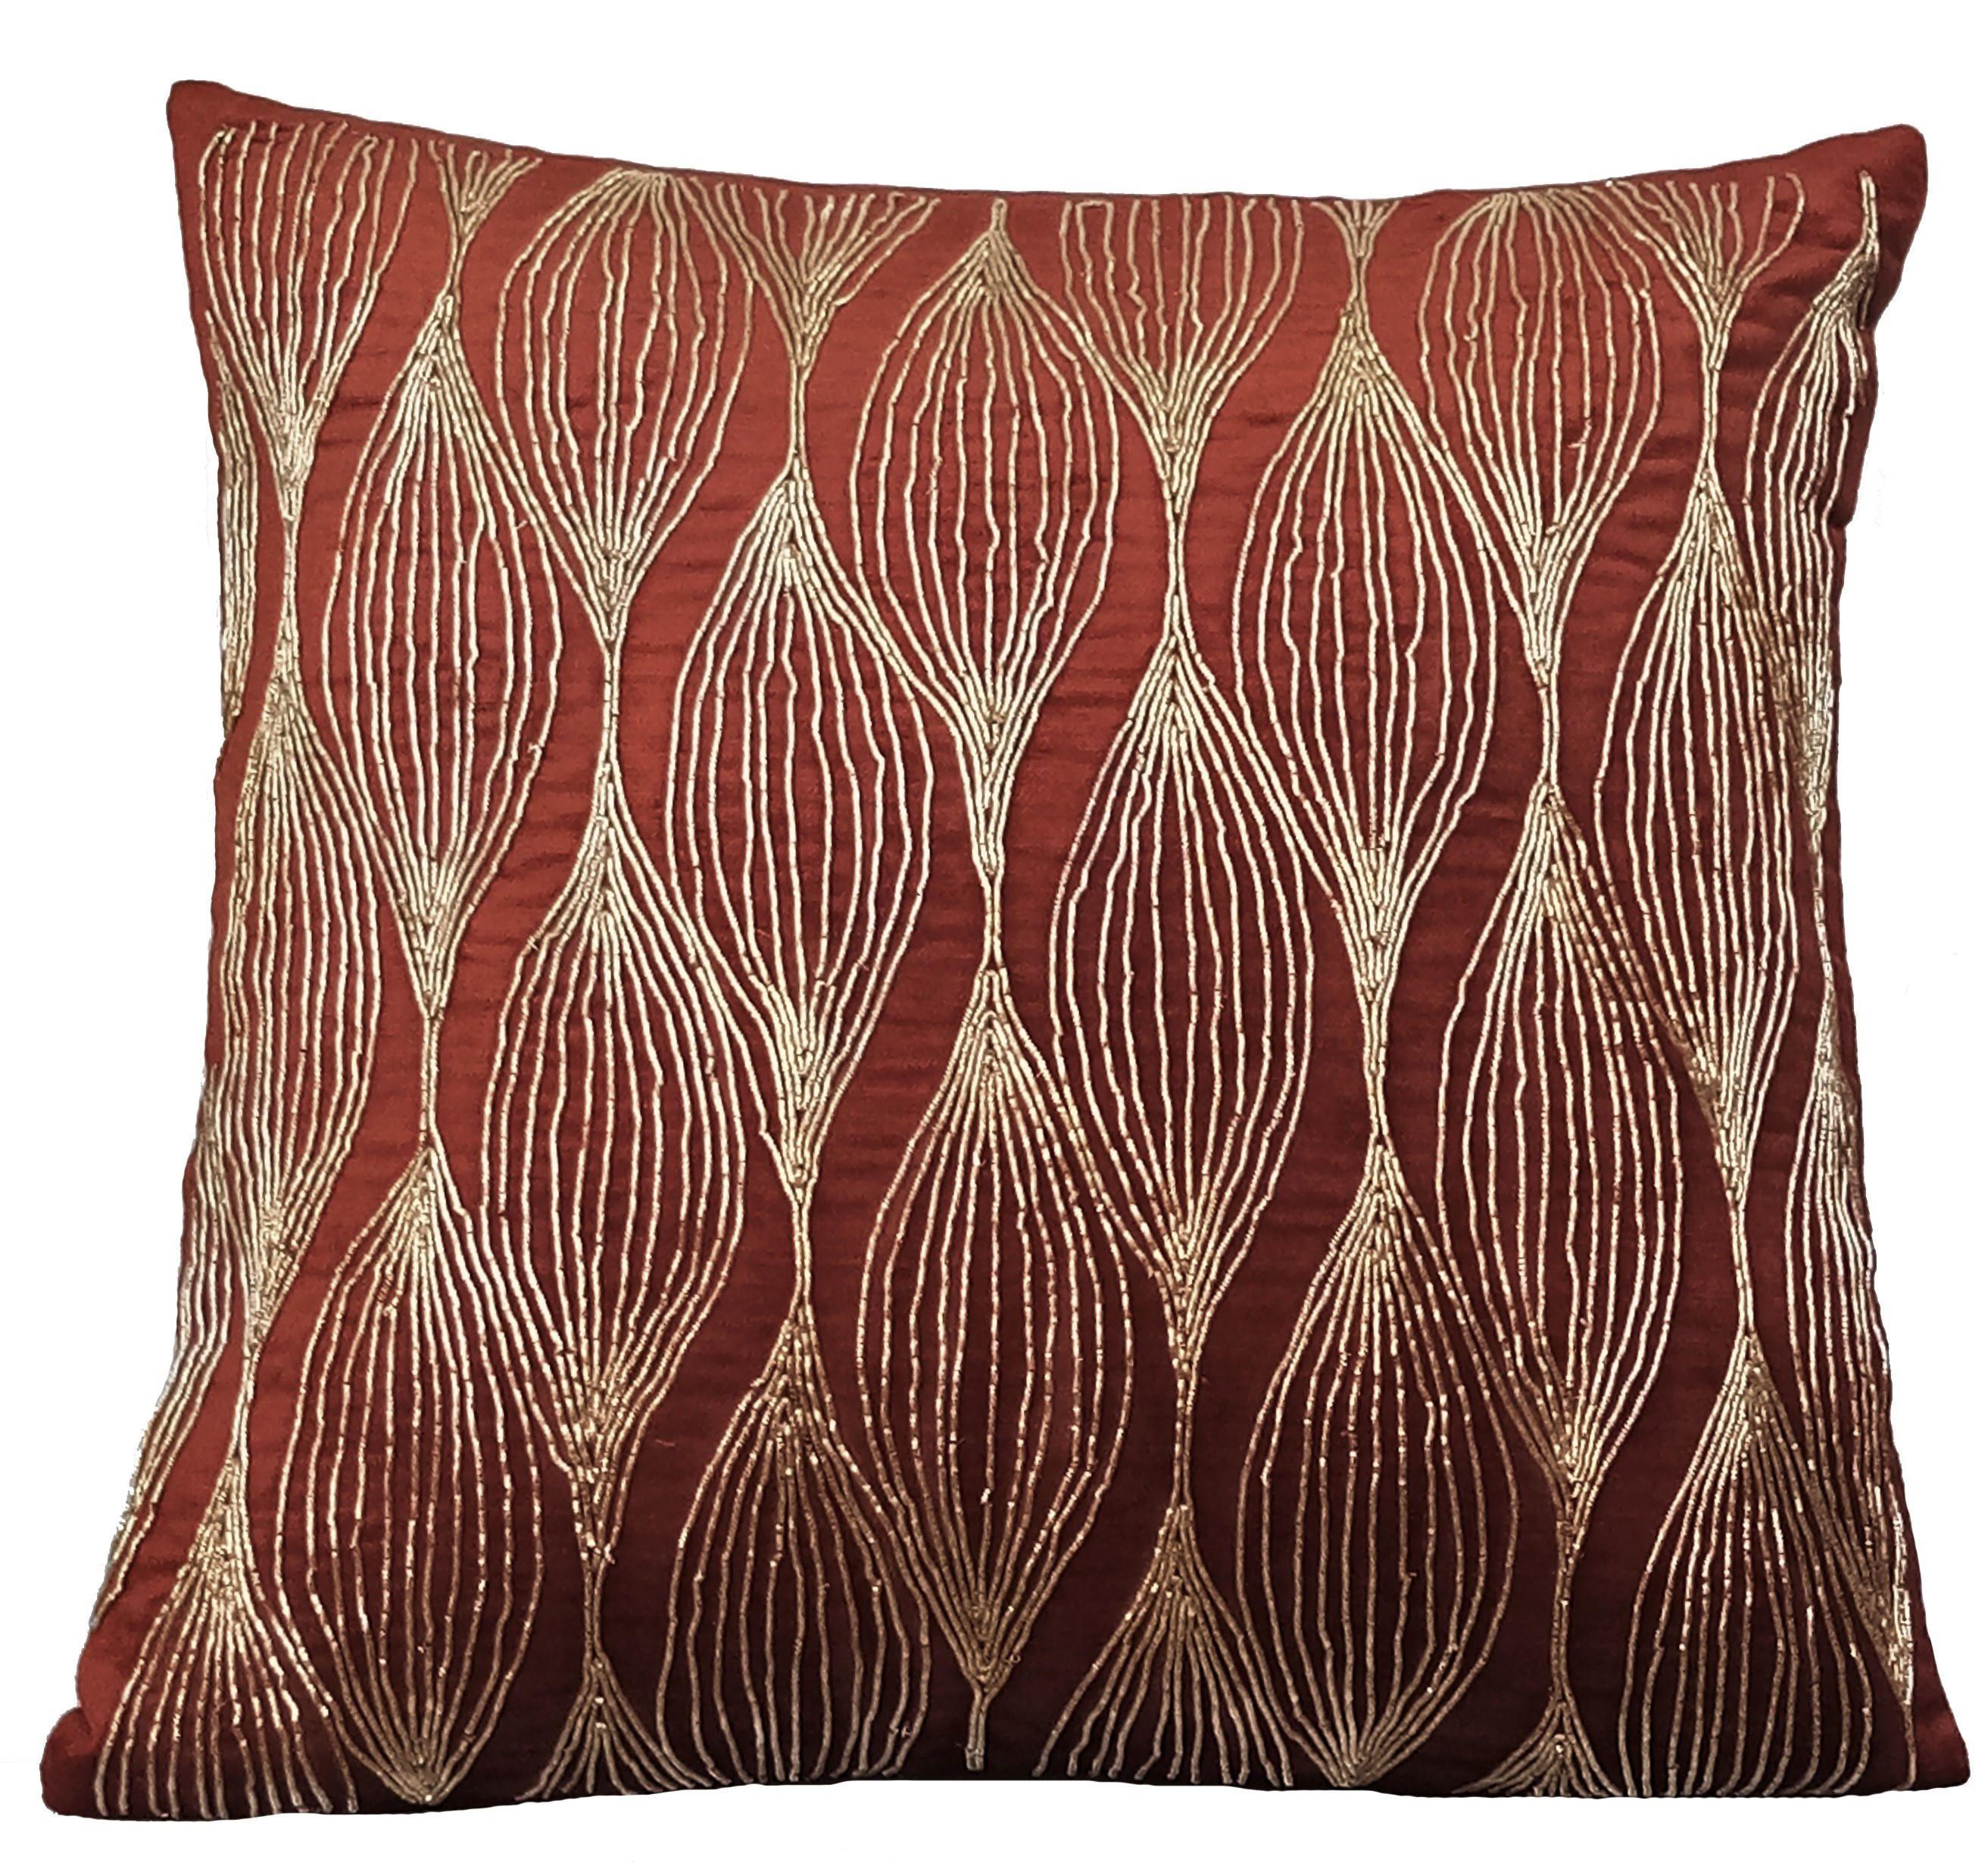 Decorative Toss Pillow Cover 16 X16 Velvet Throw For Sofa Rust